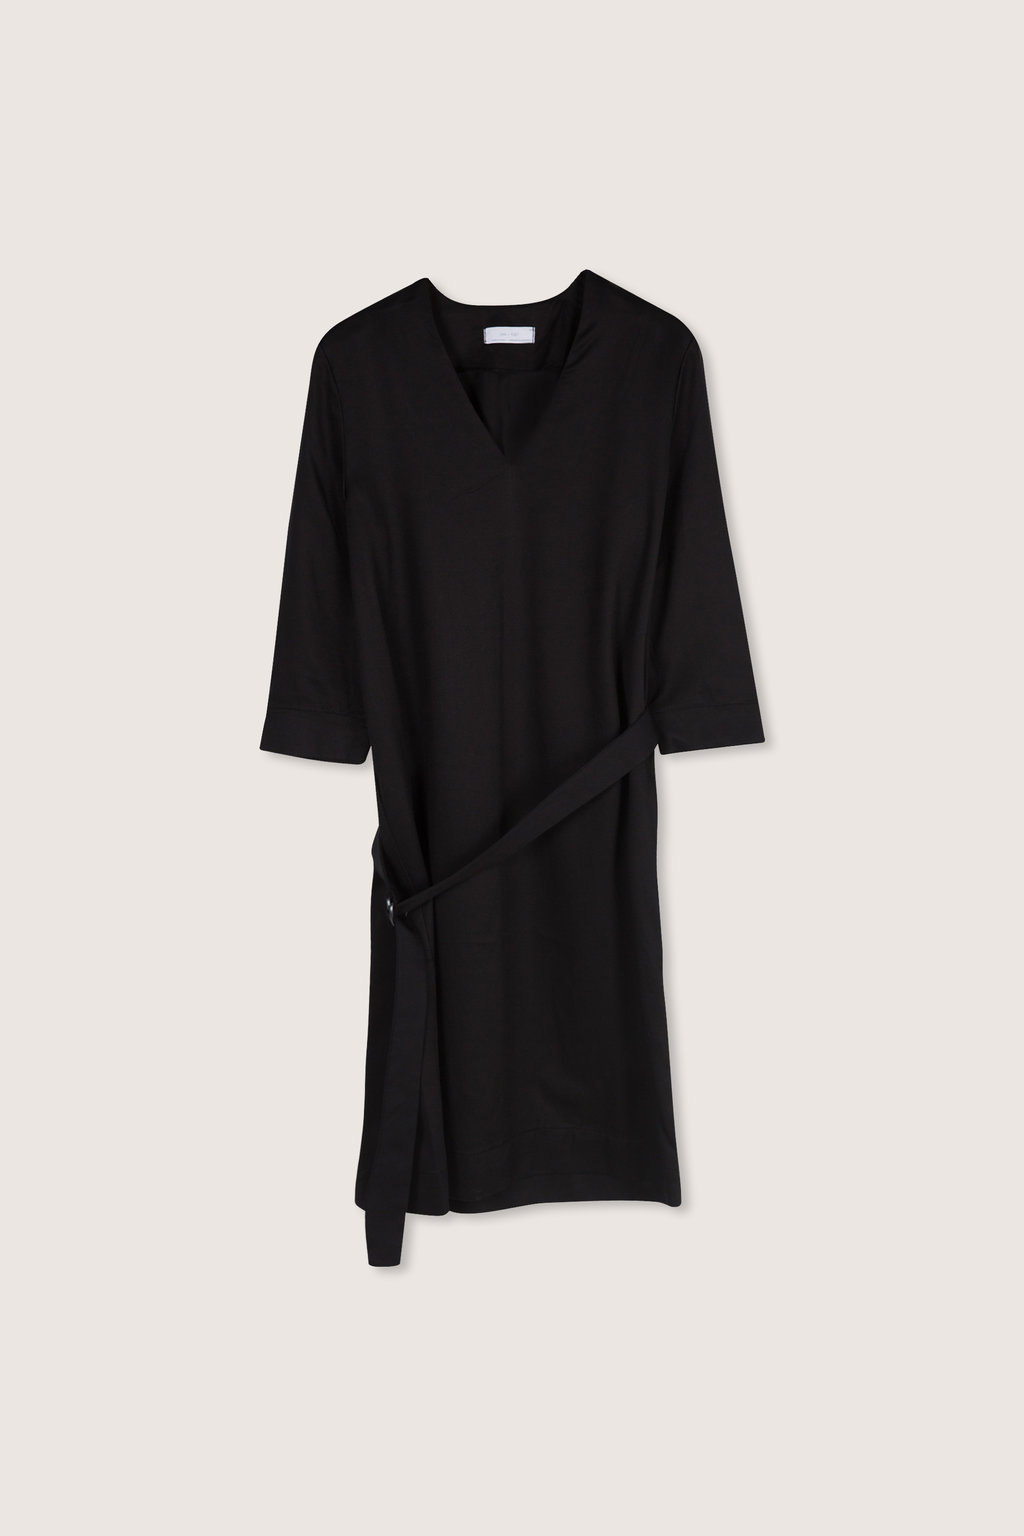 Dress 2083 Black 5